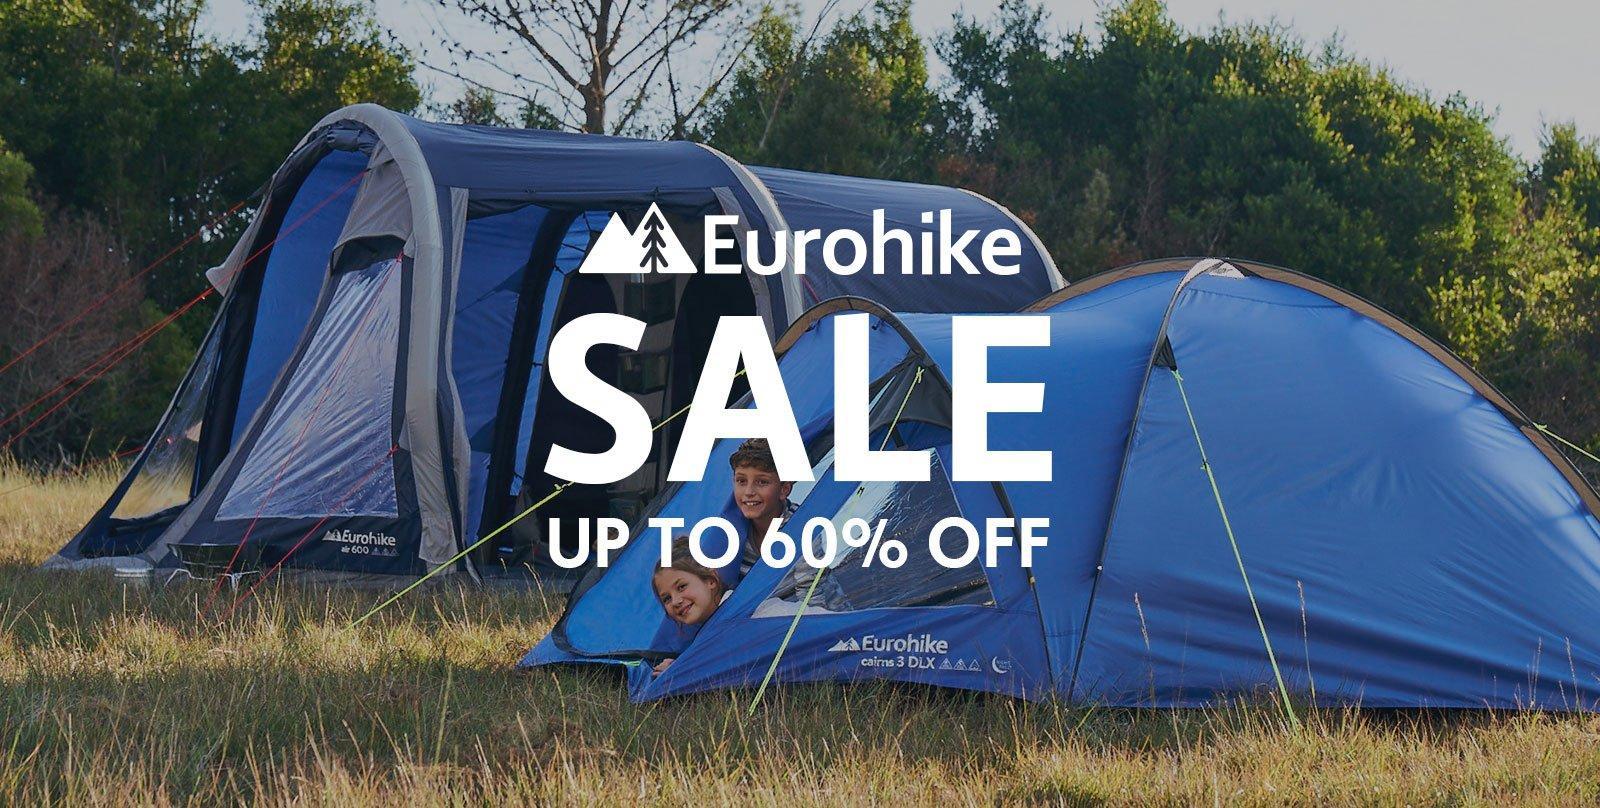 Up to 60% Off Eurohike